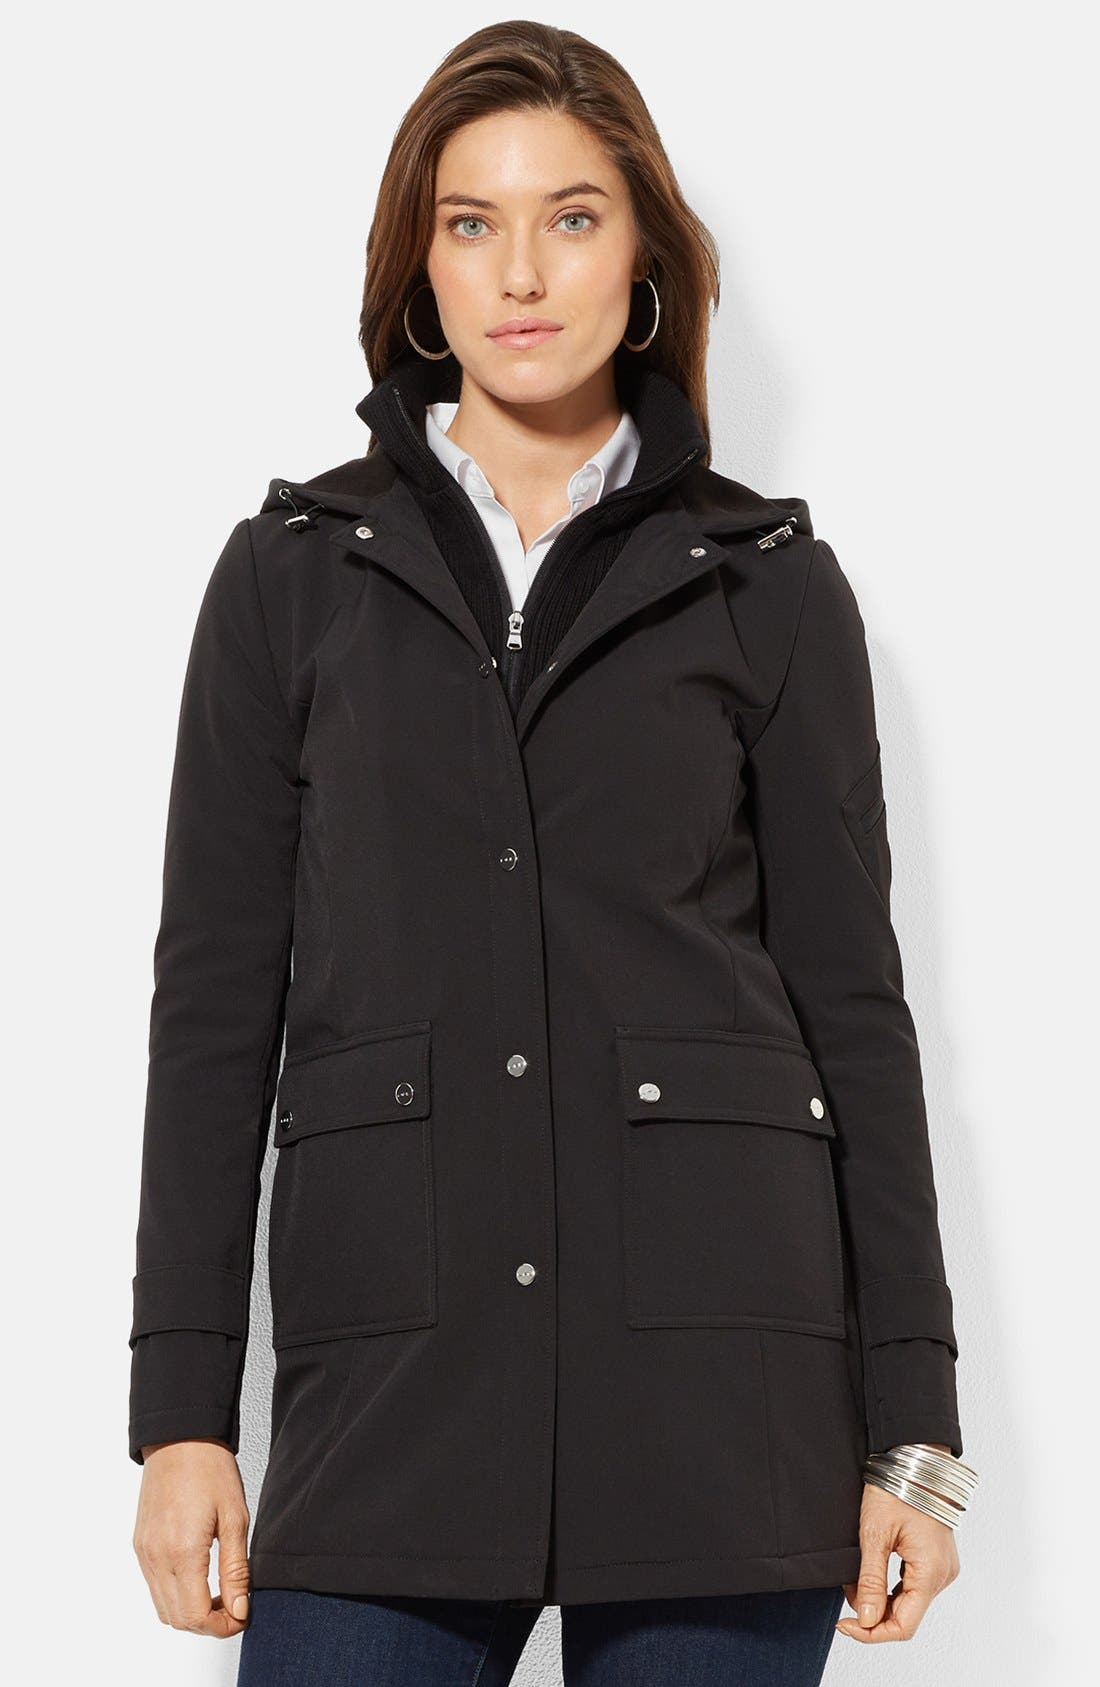 Alternate Image 1 Selected - Lauren Ralph Lauren Front Insert Hooded Soft Shell Jacket (Online Only)